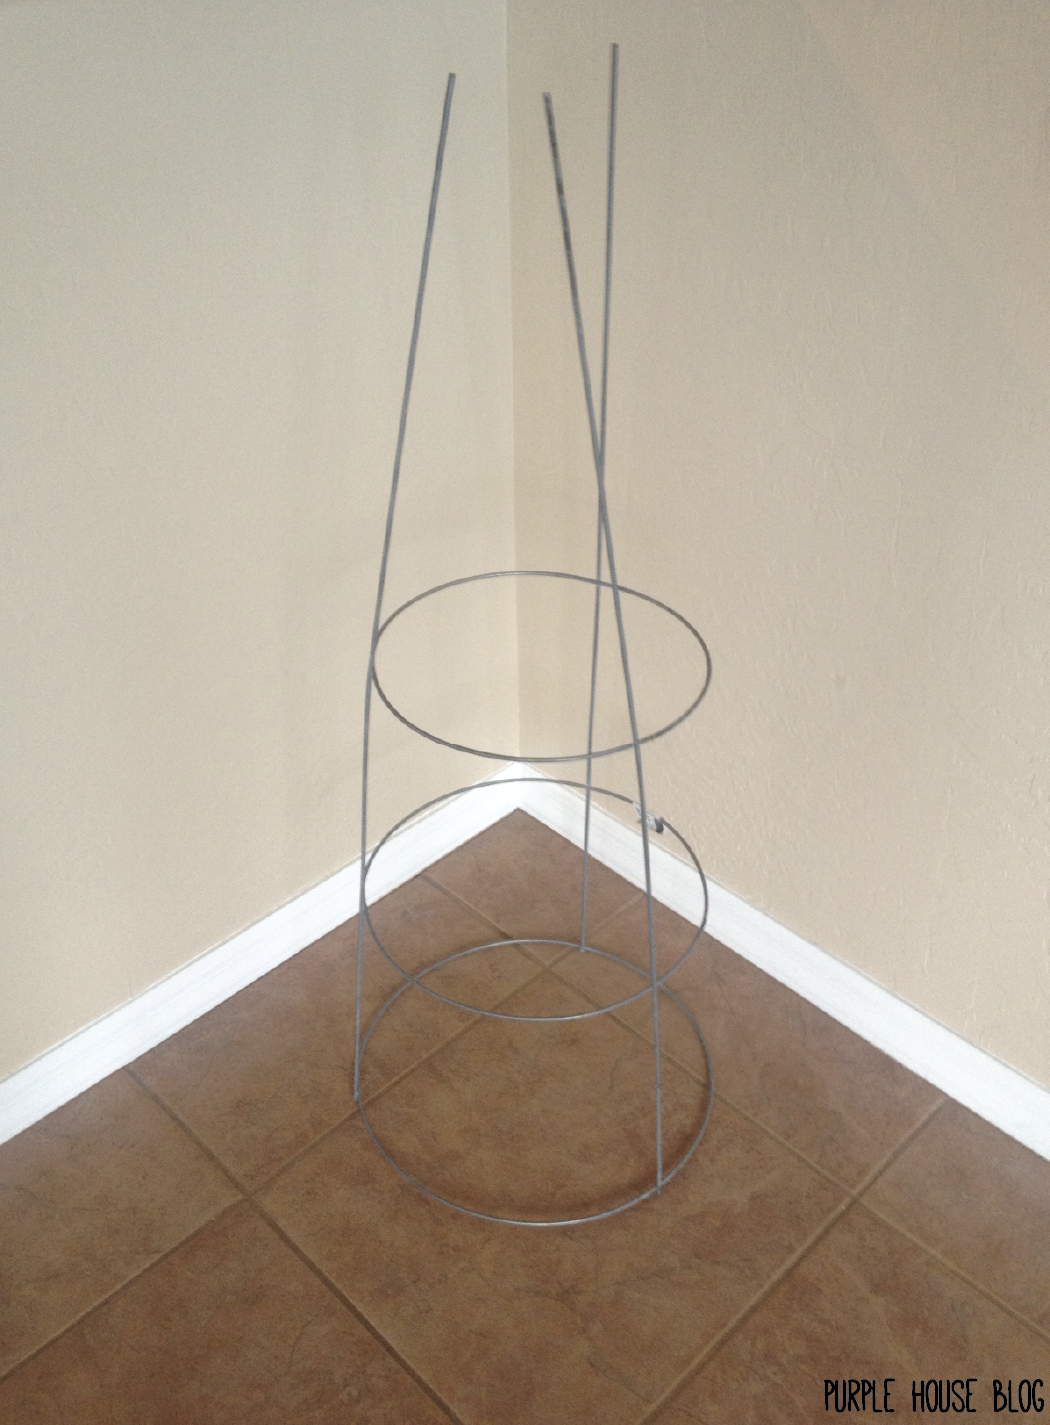 DIY 42″ Christmas Tree for Under $12 | Purple House Blog